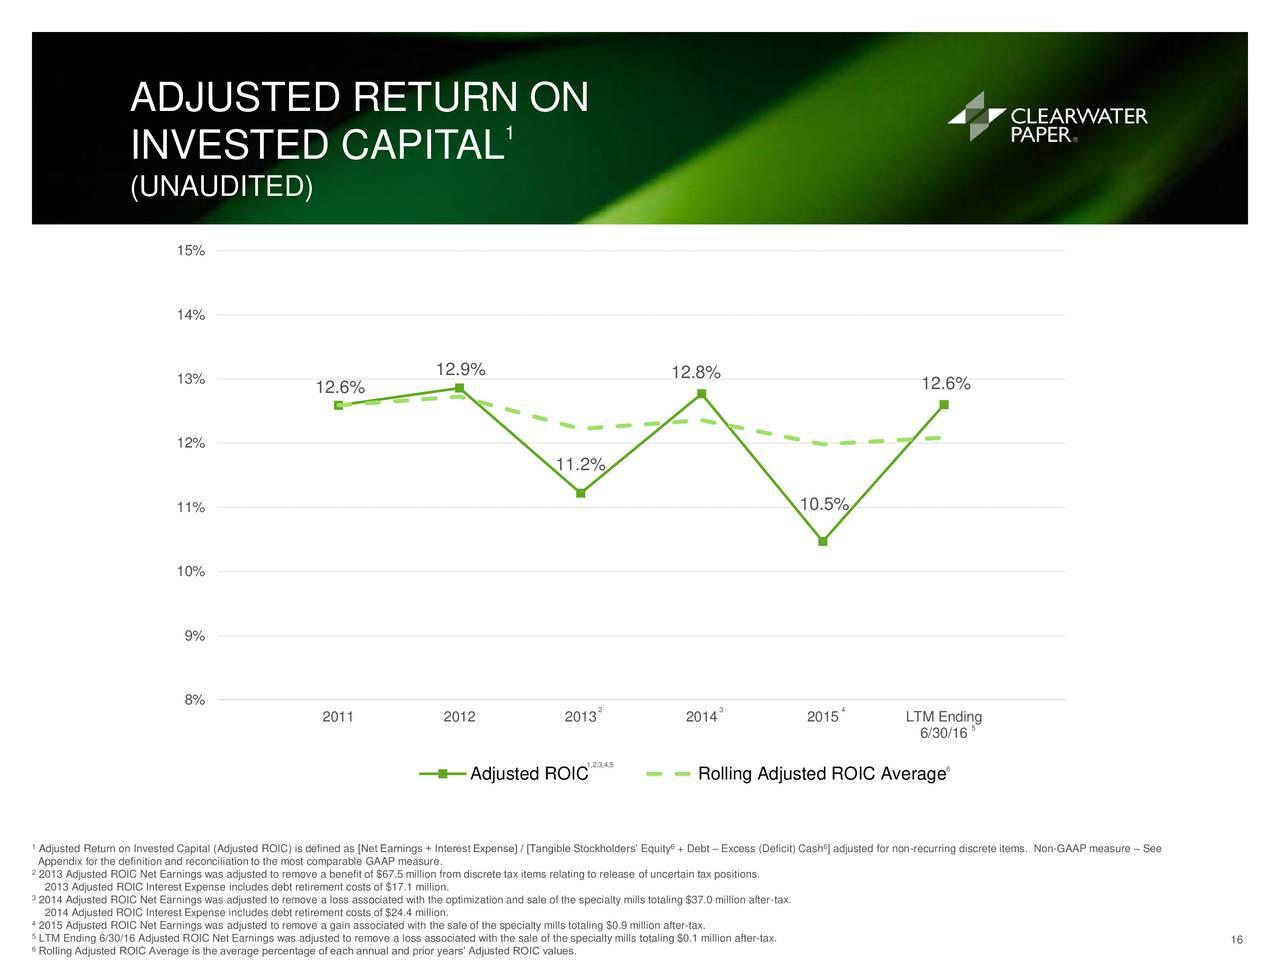 5 Best Momentum Stocks to Buy Using Driehaus Strategy - oukas.info